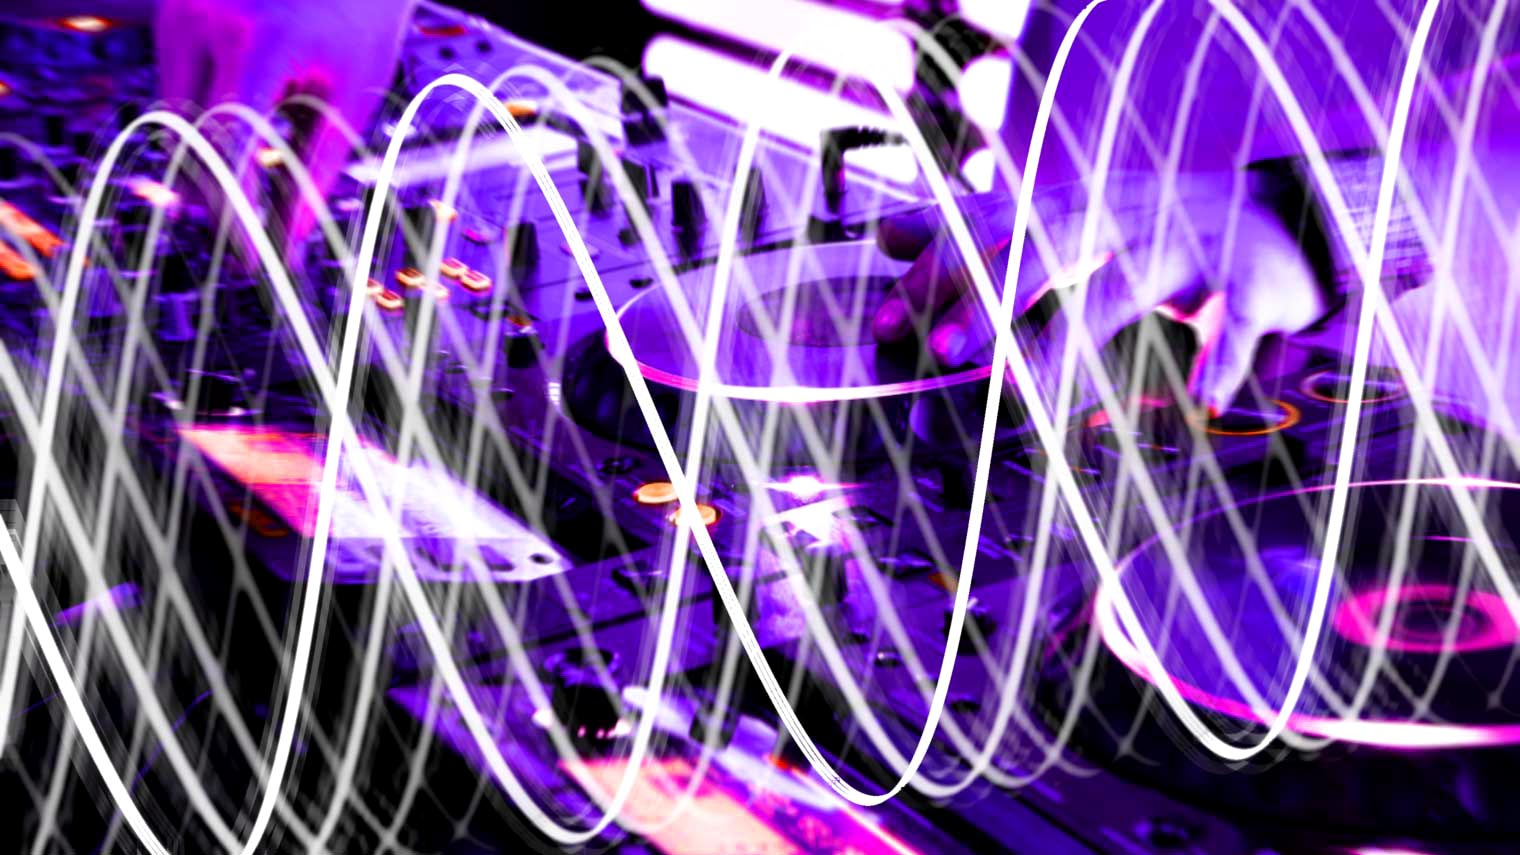 Music Visualizer VJ Software Beyond Magic Music Visuals 1520x855